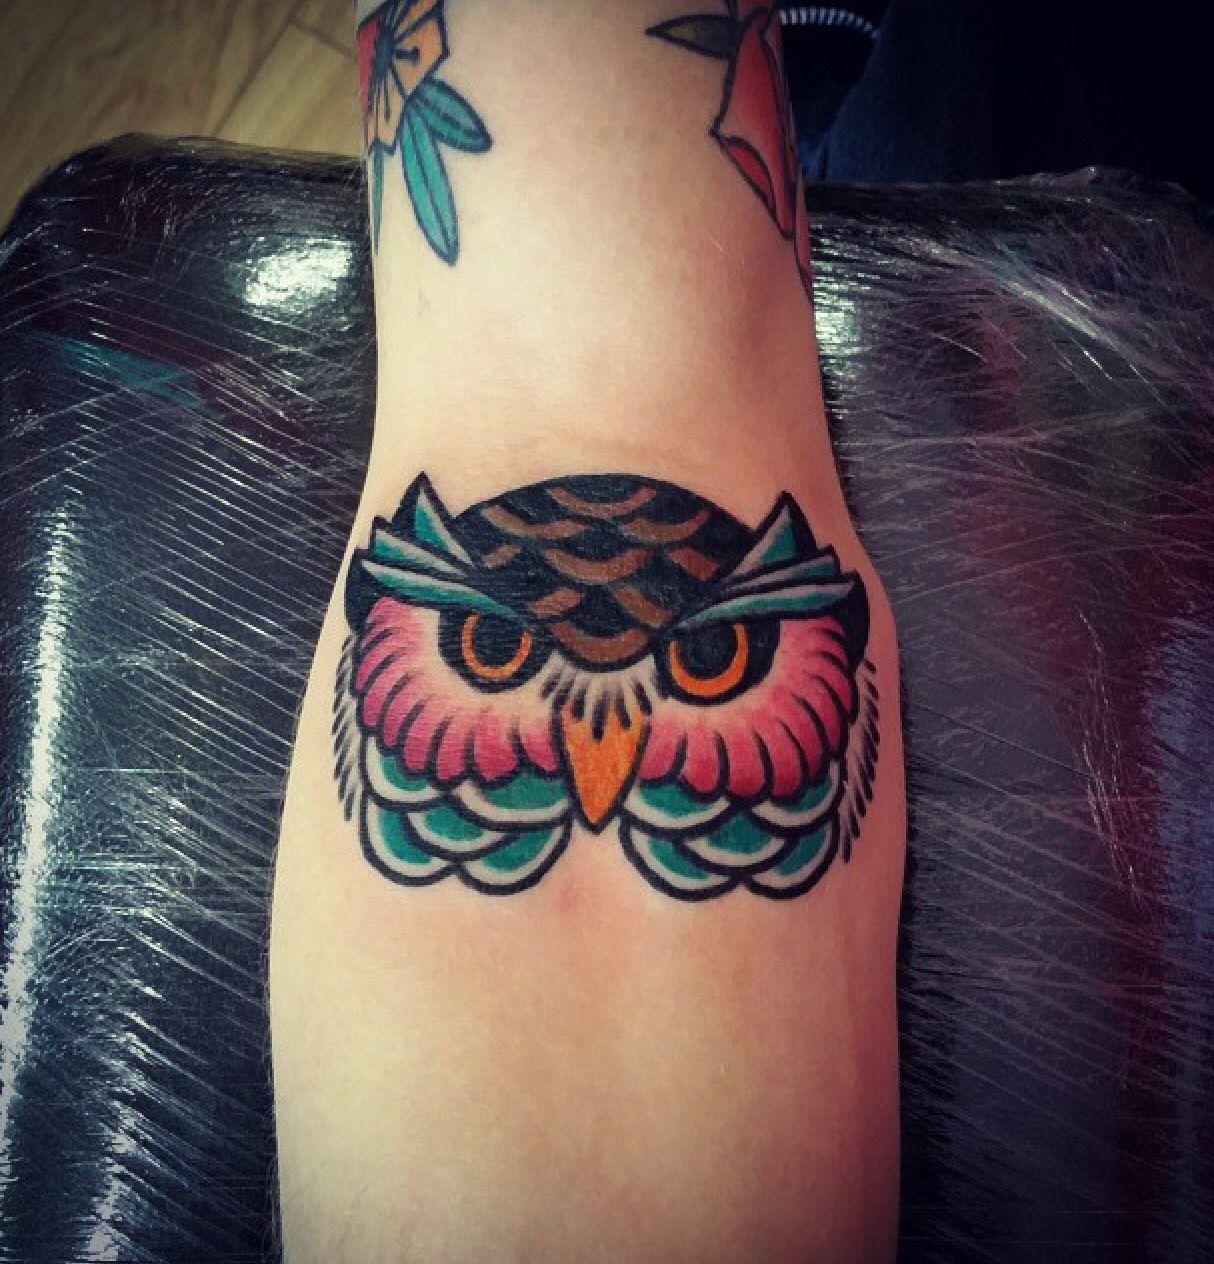 Colourful owl tattoo Matt did this morning